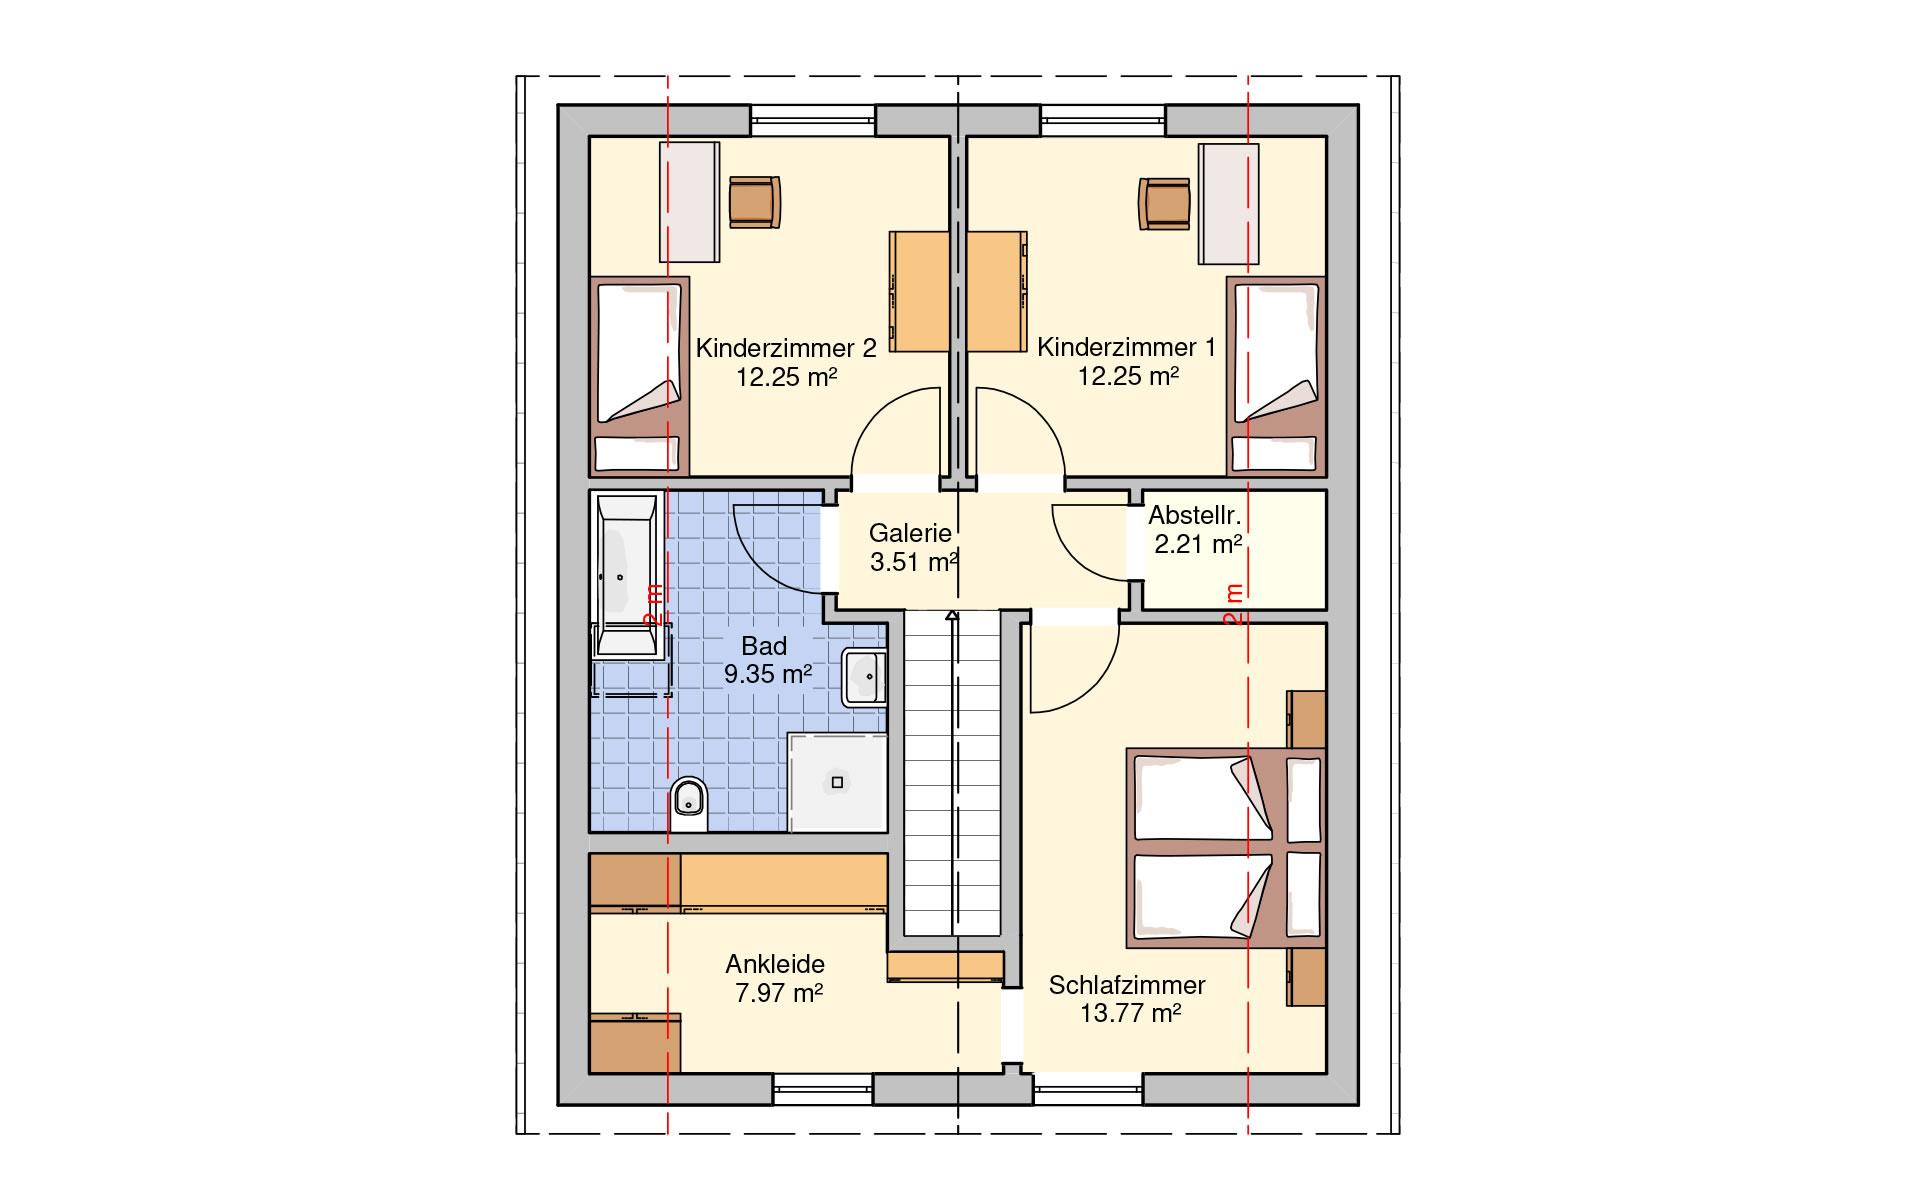 Dachgeschoss Paris von Fingerhut Haus GmbH & Co. KG